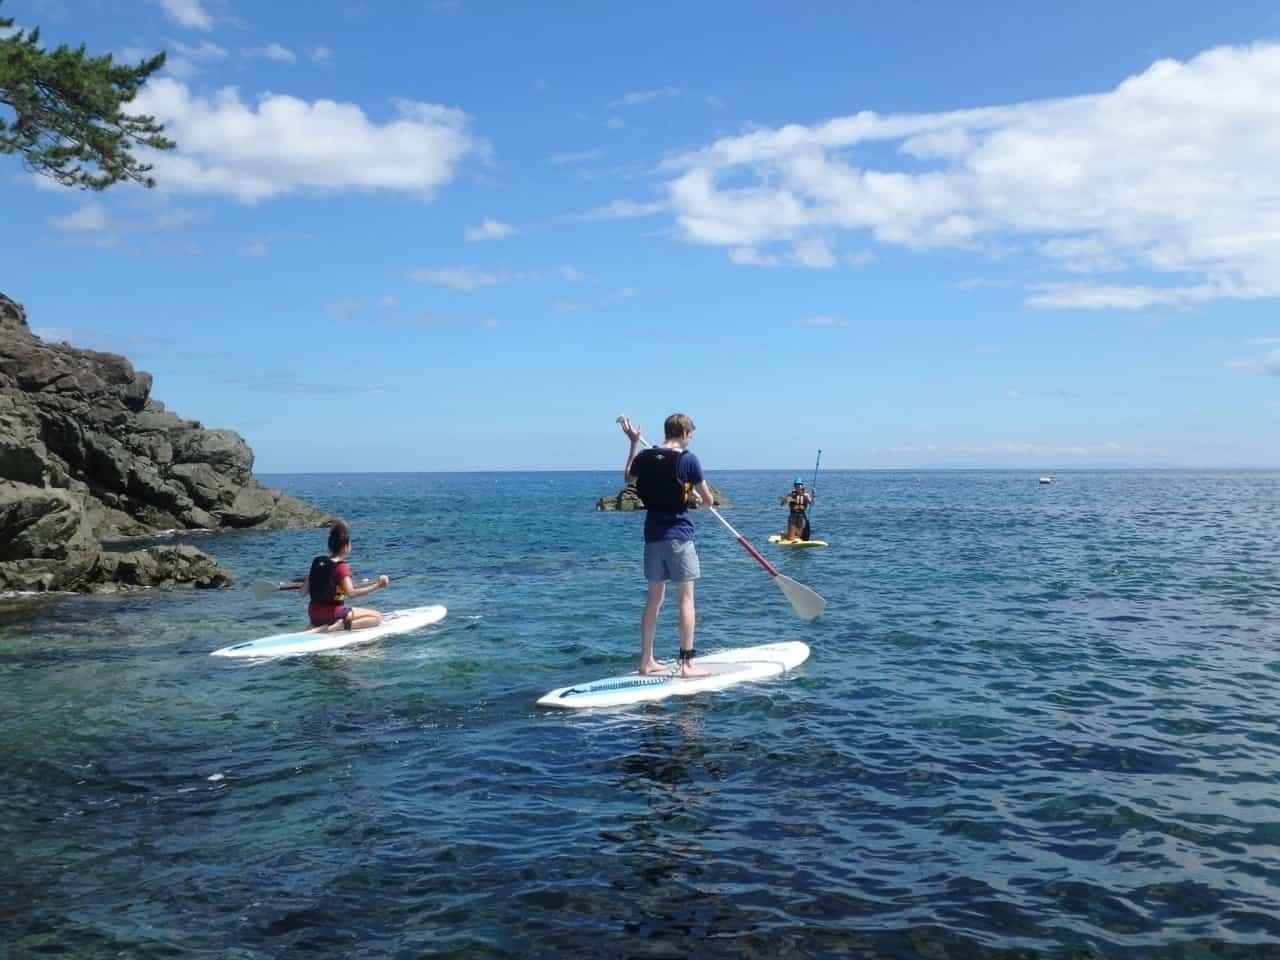 Beach Activities in Wakasa Takahama to Admire Stunning Nature Along Sea of Japan!